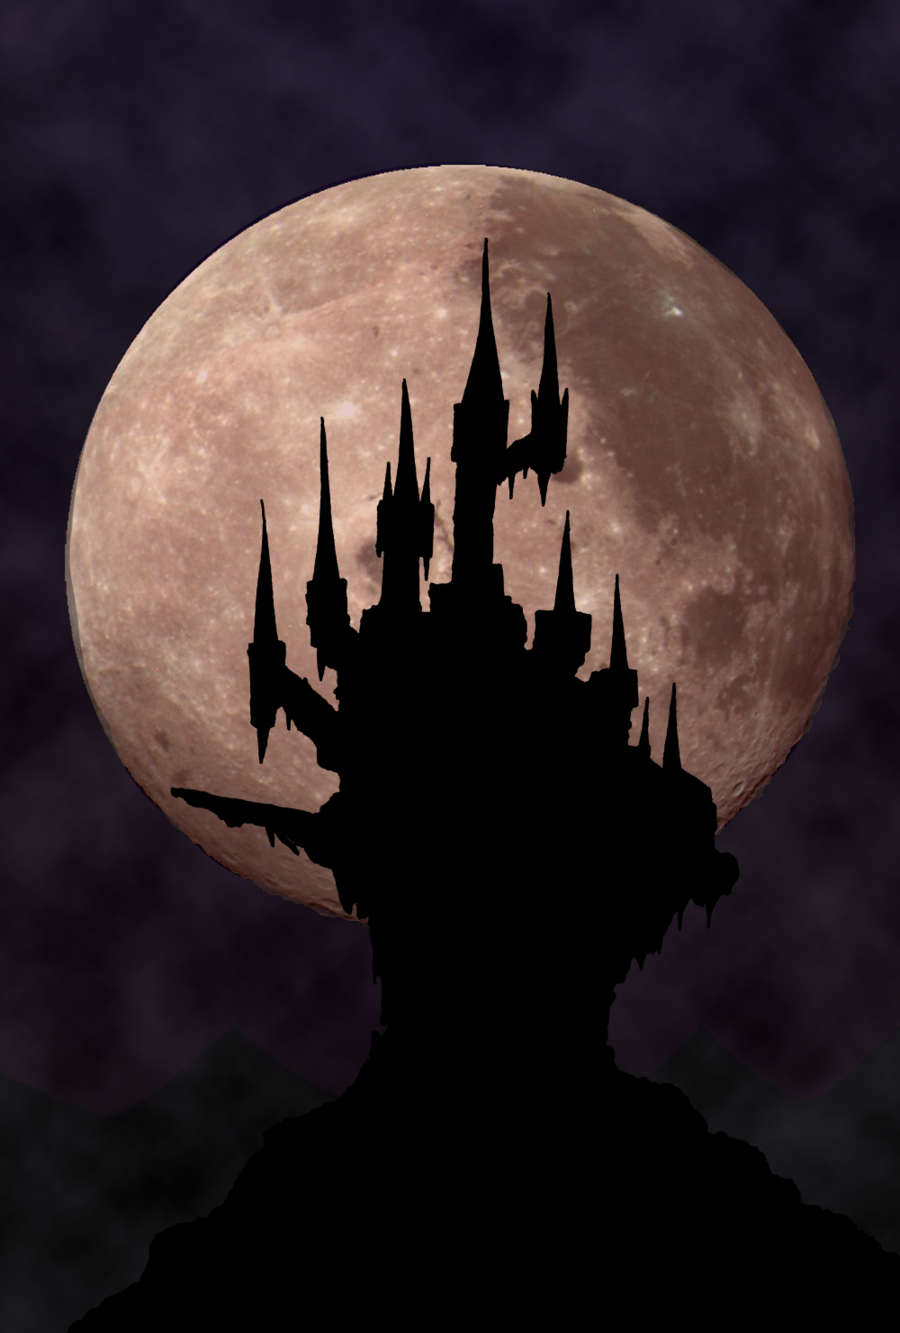 Castlevania Full Moon 1691 By Tufsing On Deviantart Game Art Fantasy Art Artwork